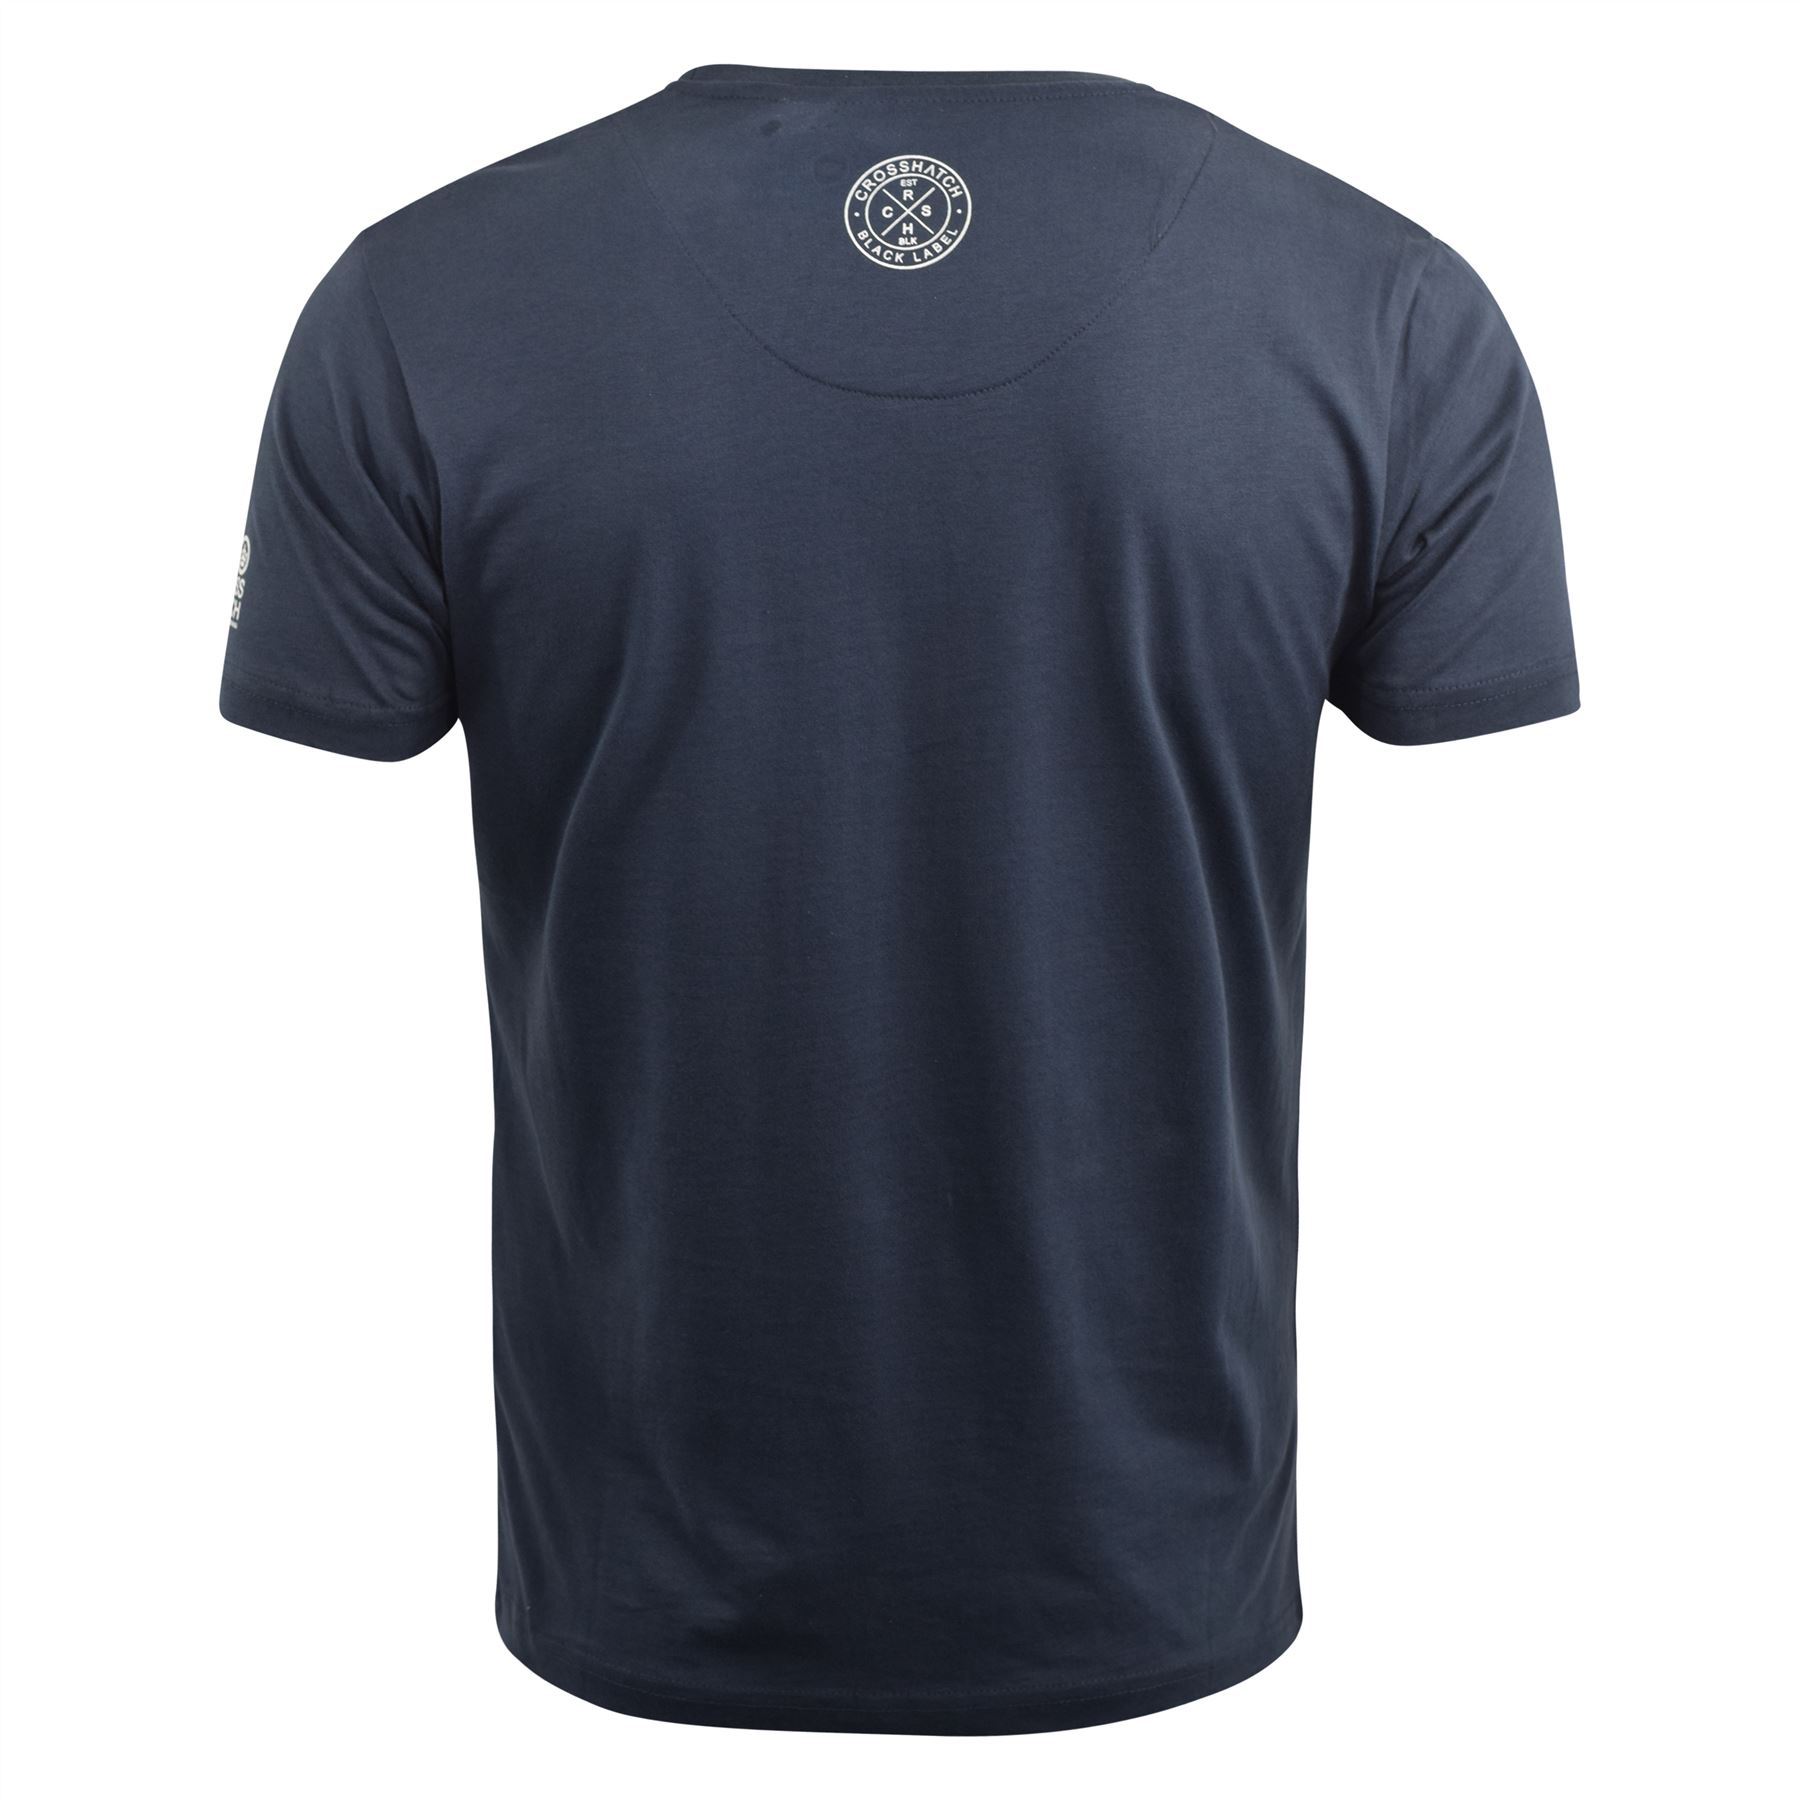 Para-Hombre-Crosshatch-Camiseta-Grafico-Cuello-Redondo-Manga-Corta-Camiseta-Top-wolvey miniatura 7